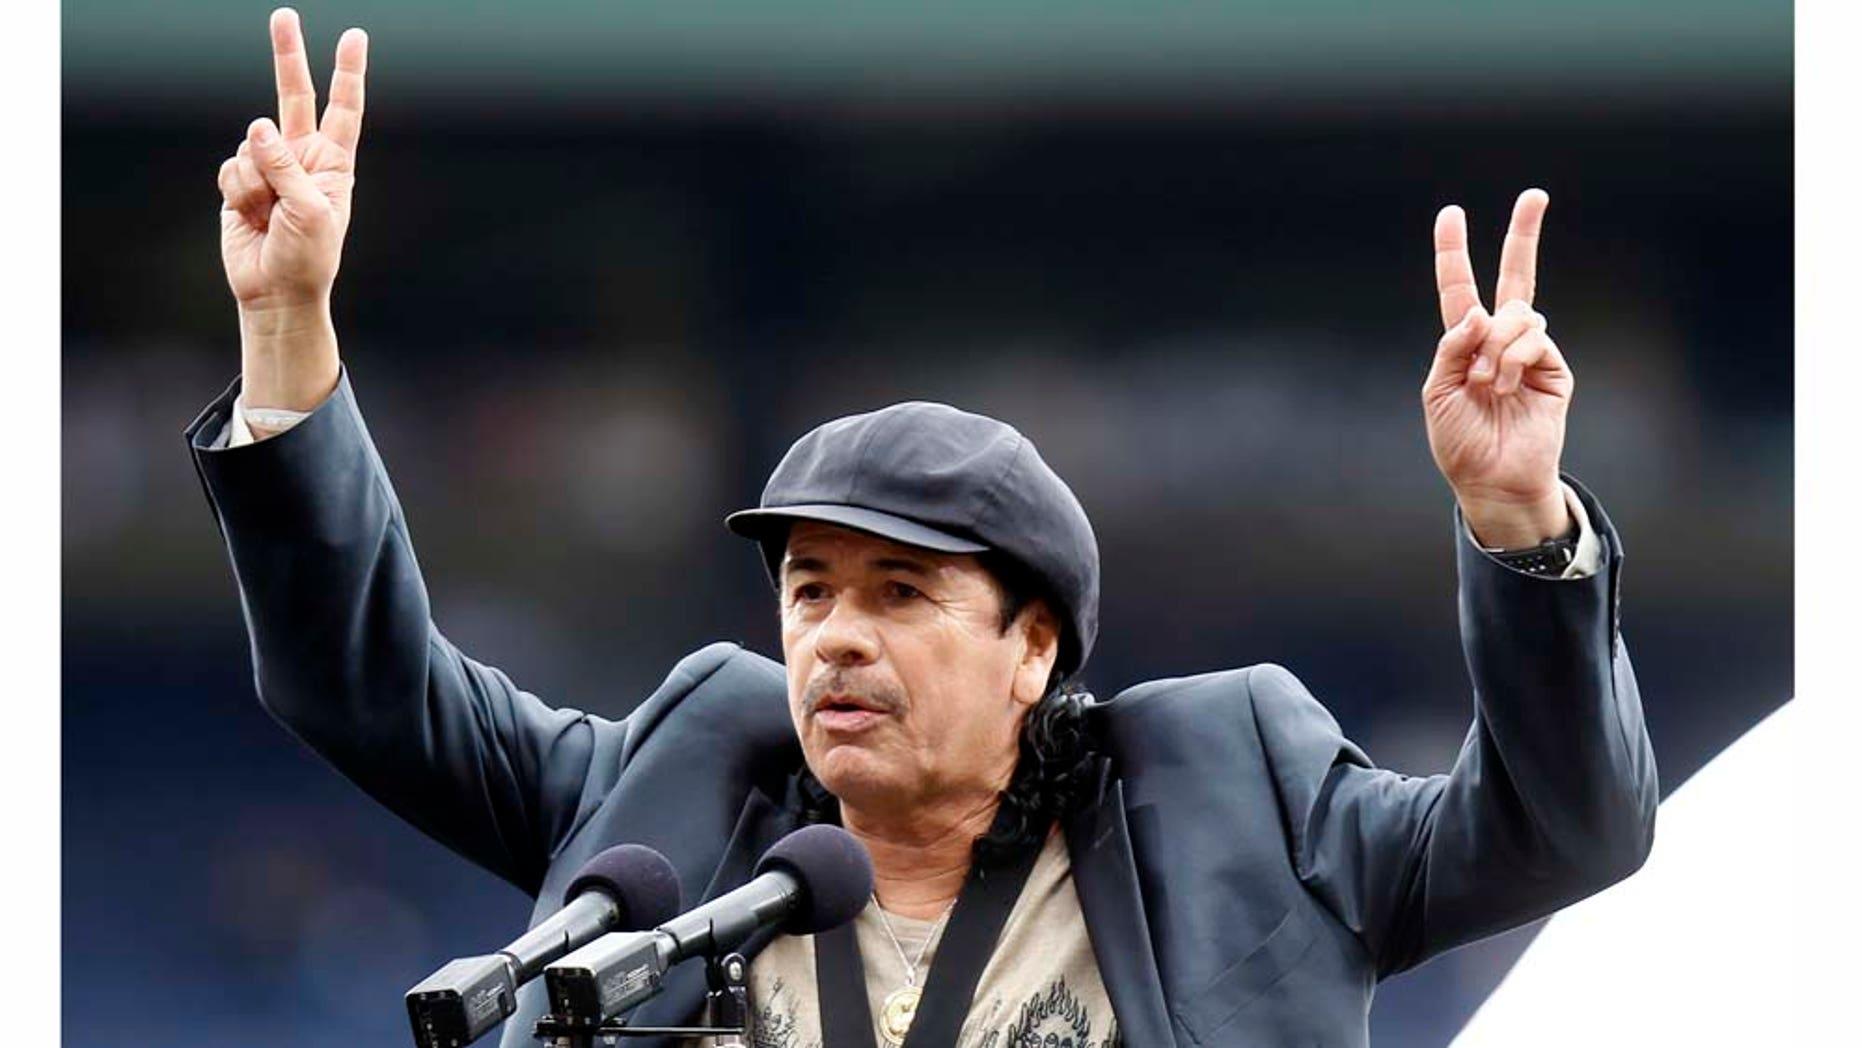 Carlos Santana was mad